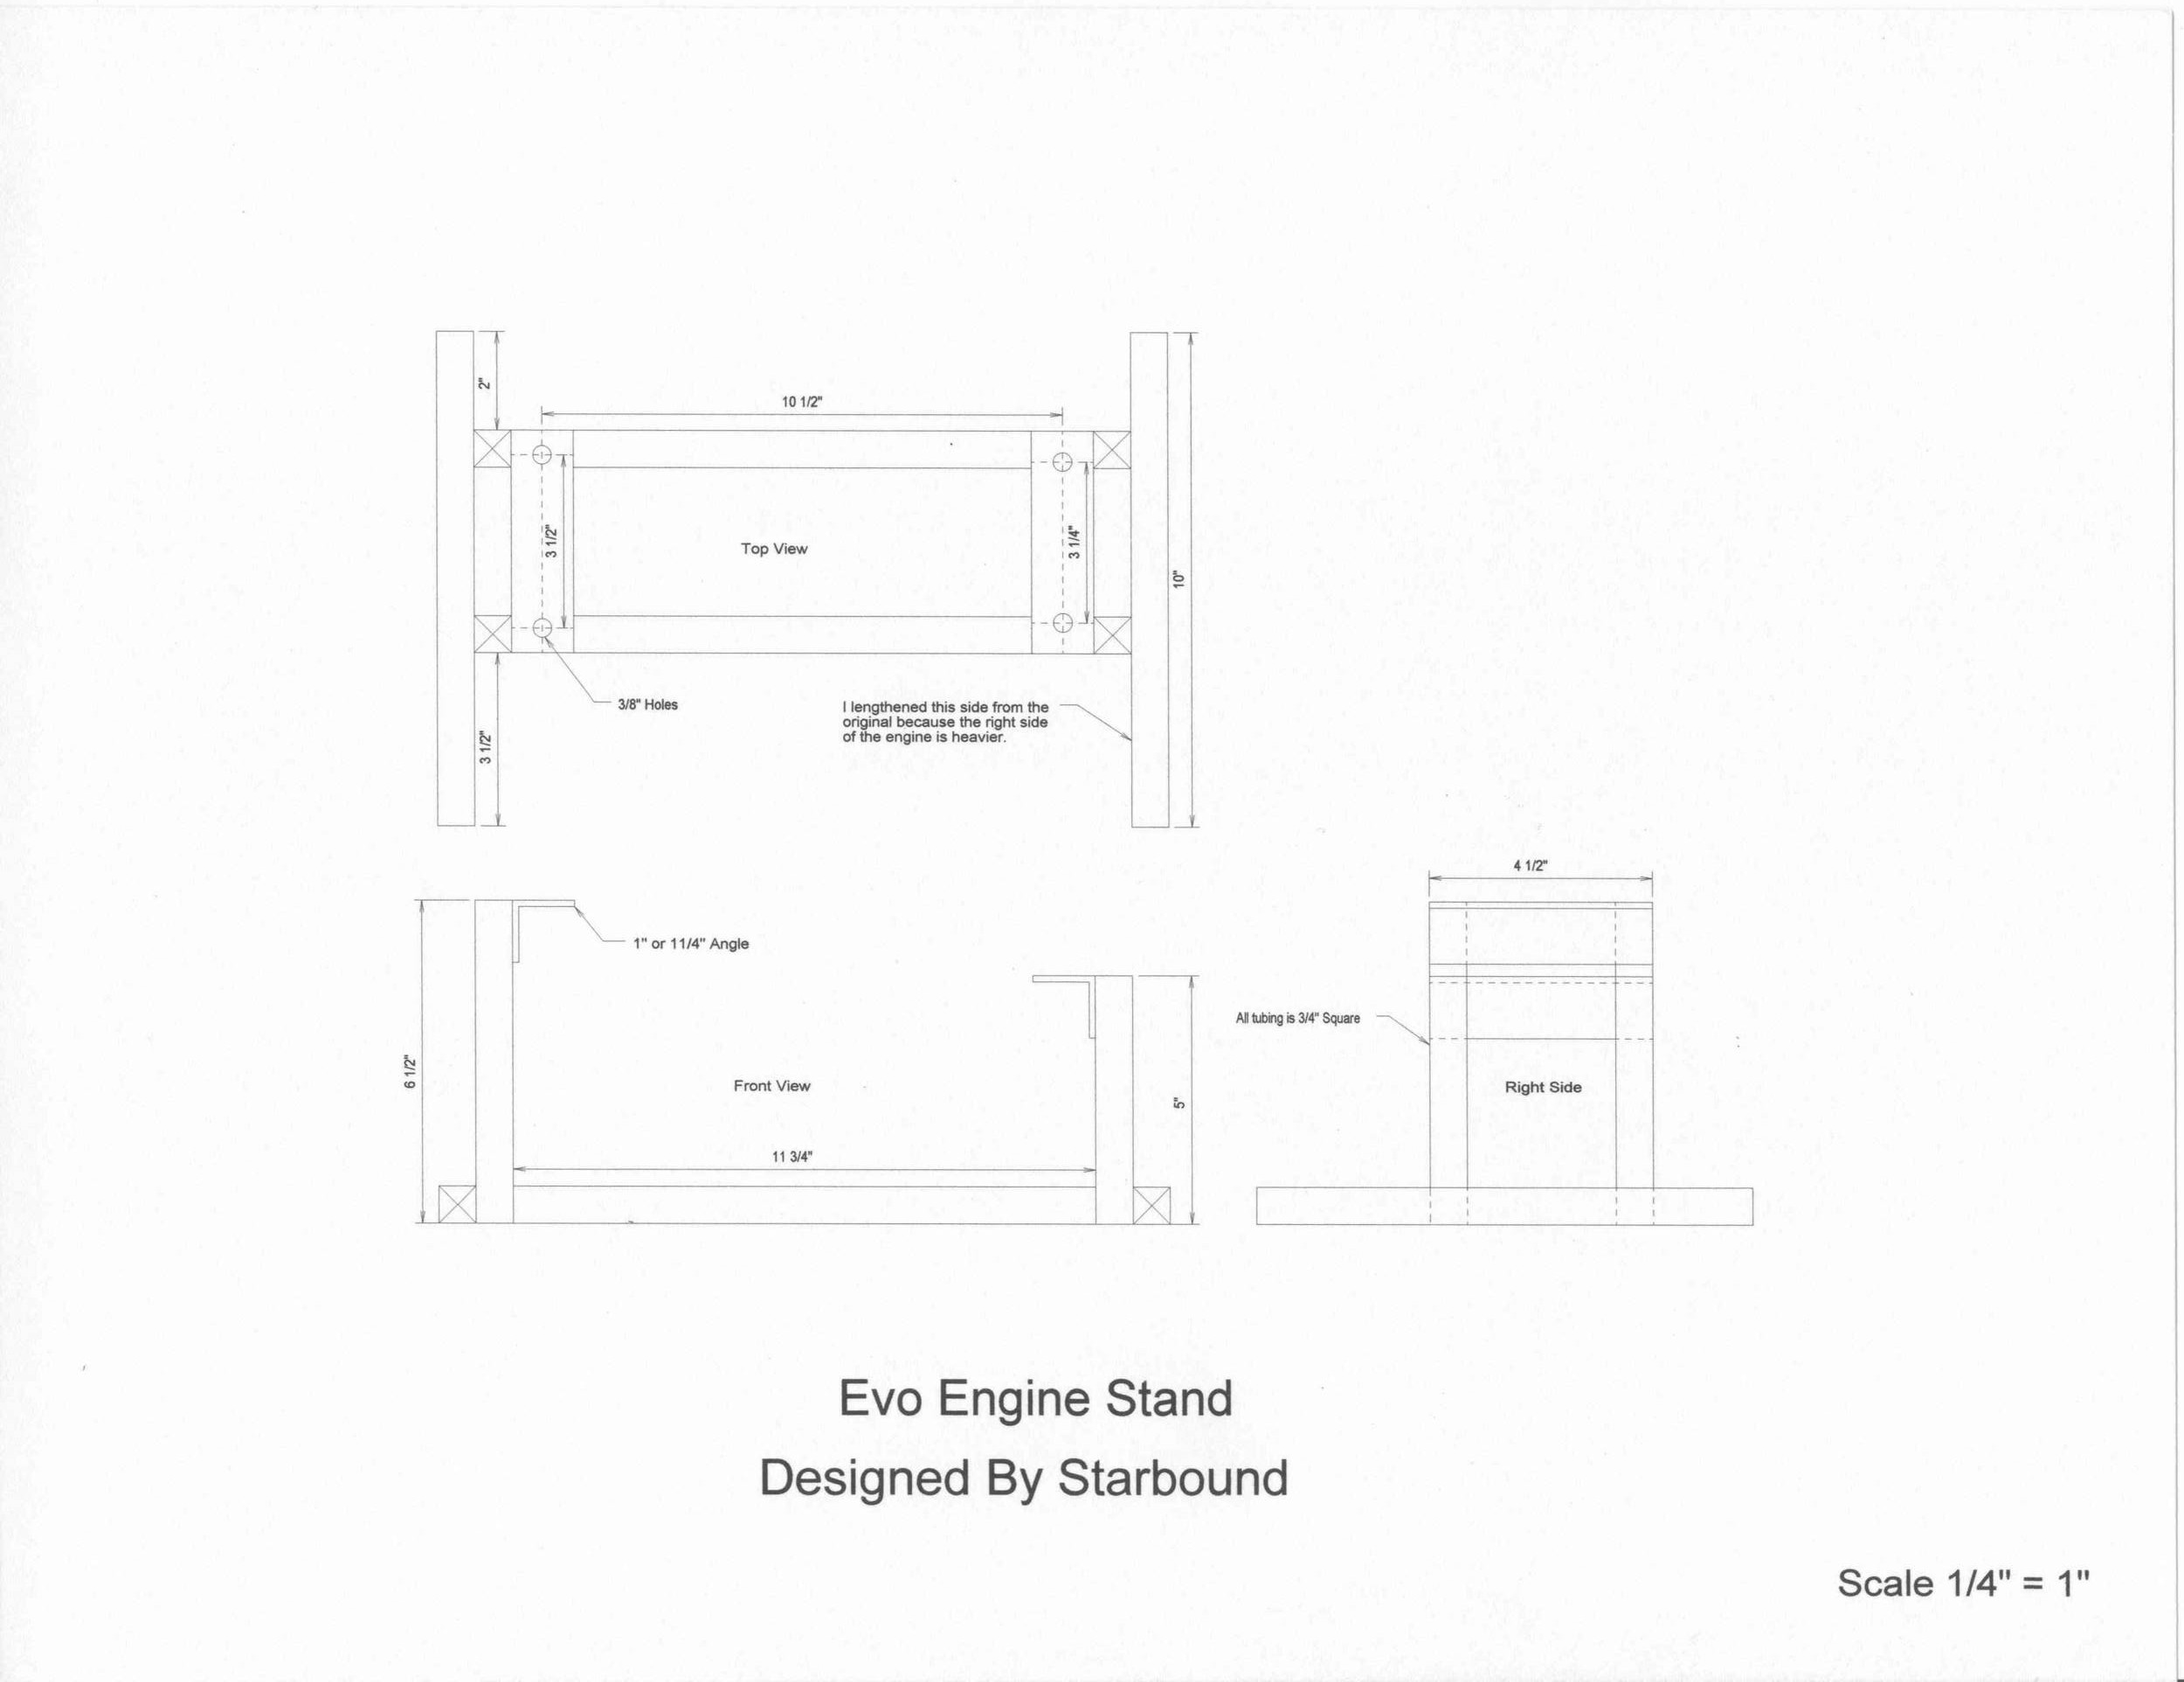 small resolution of 80 harley evolution engine diagram wiring diagramplans for a harley motor stand u2013 mustaribrandharley